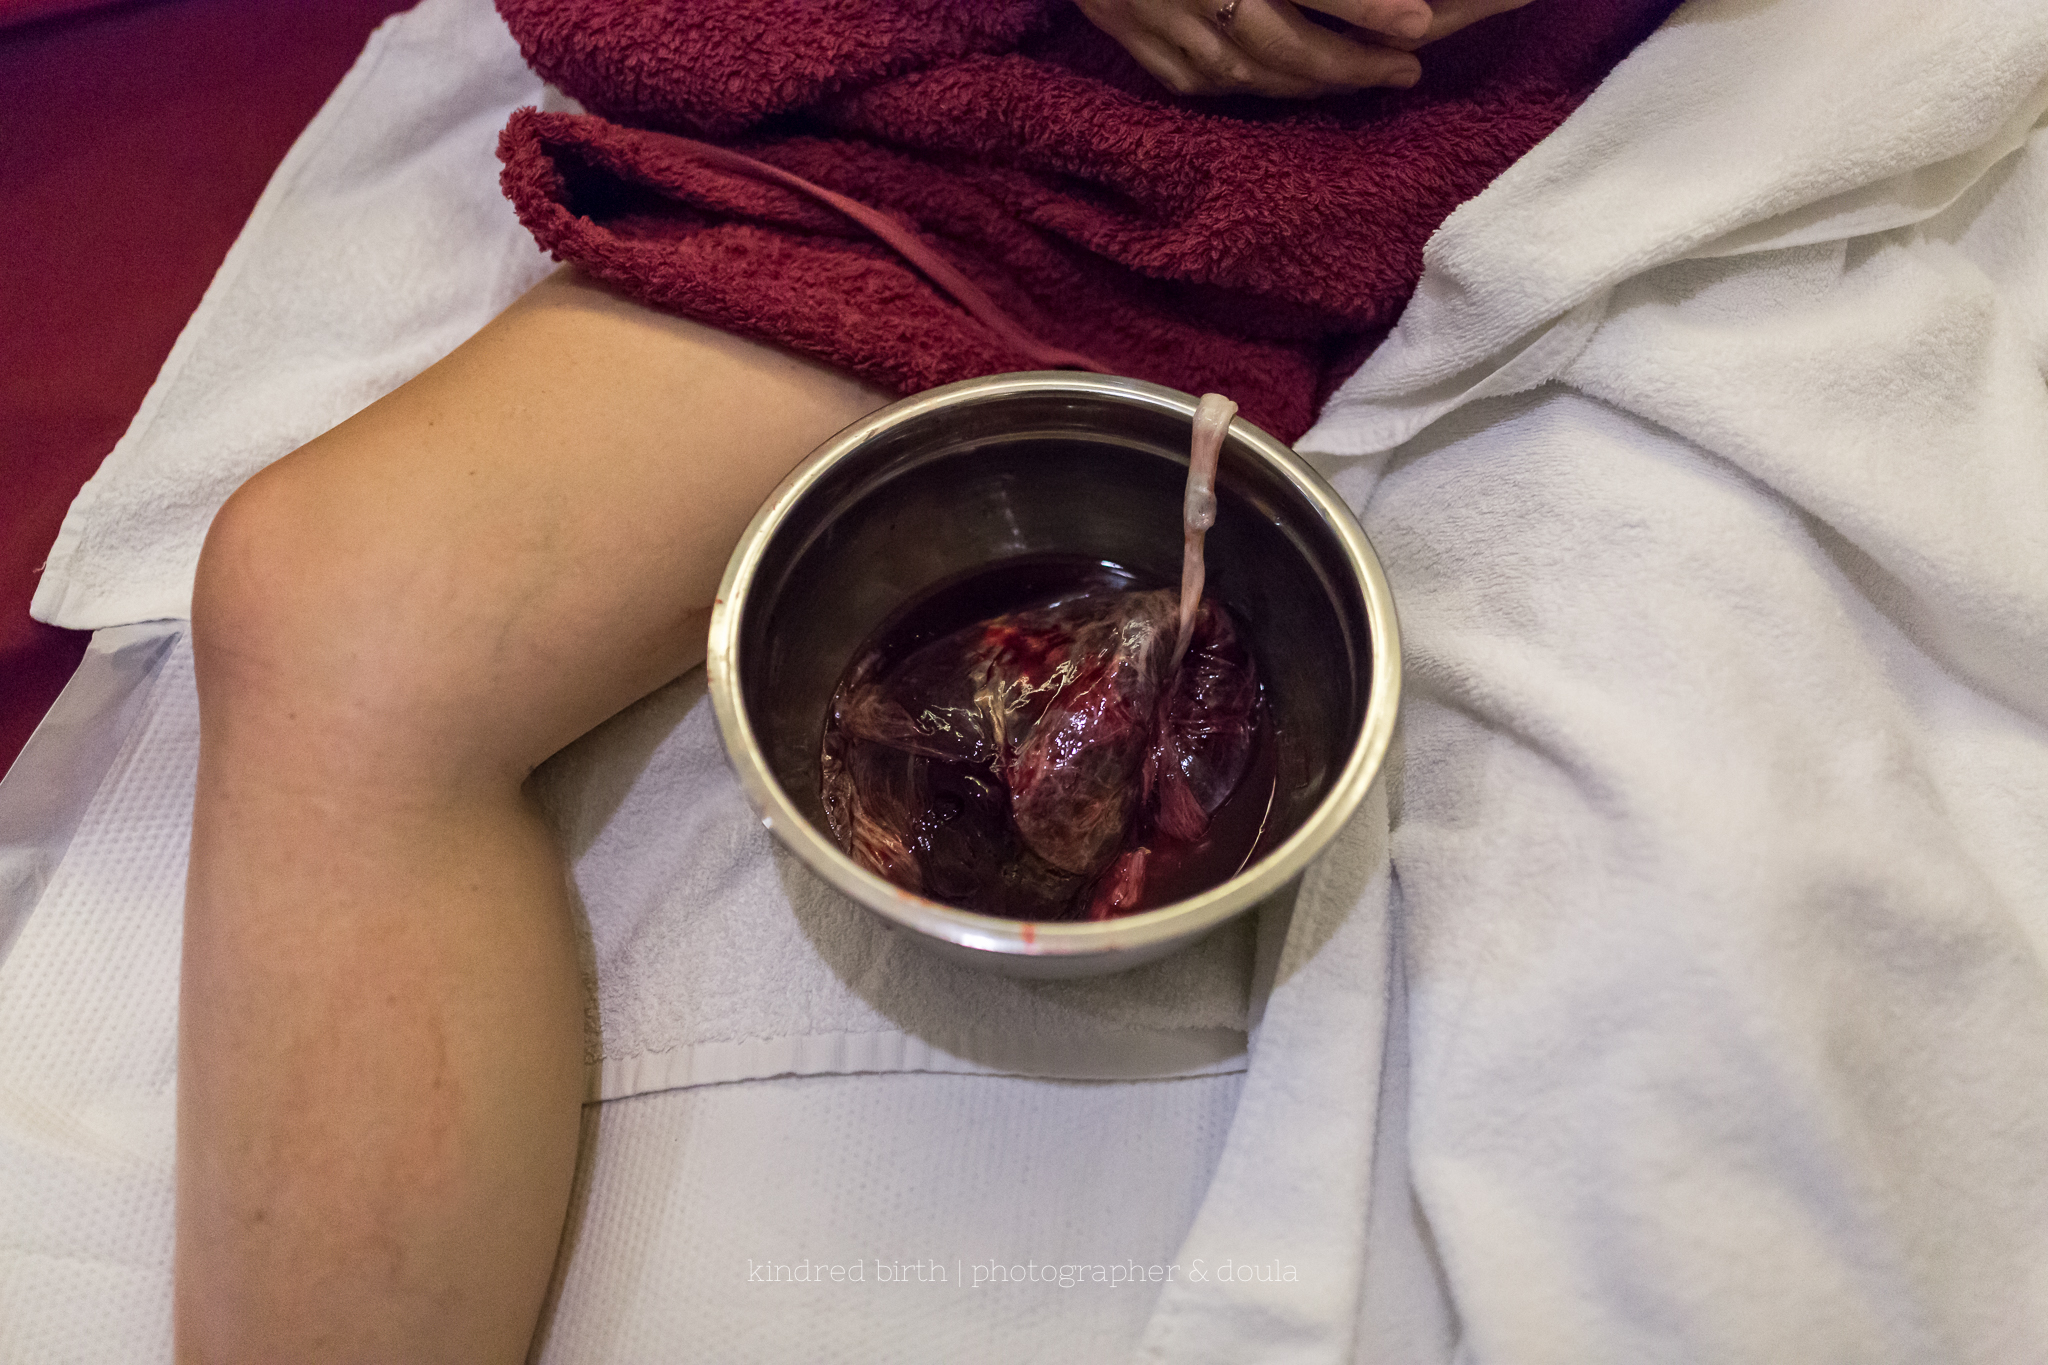 placenta in bowl